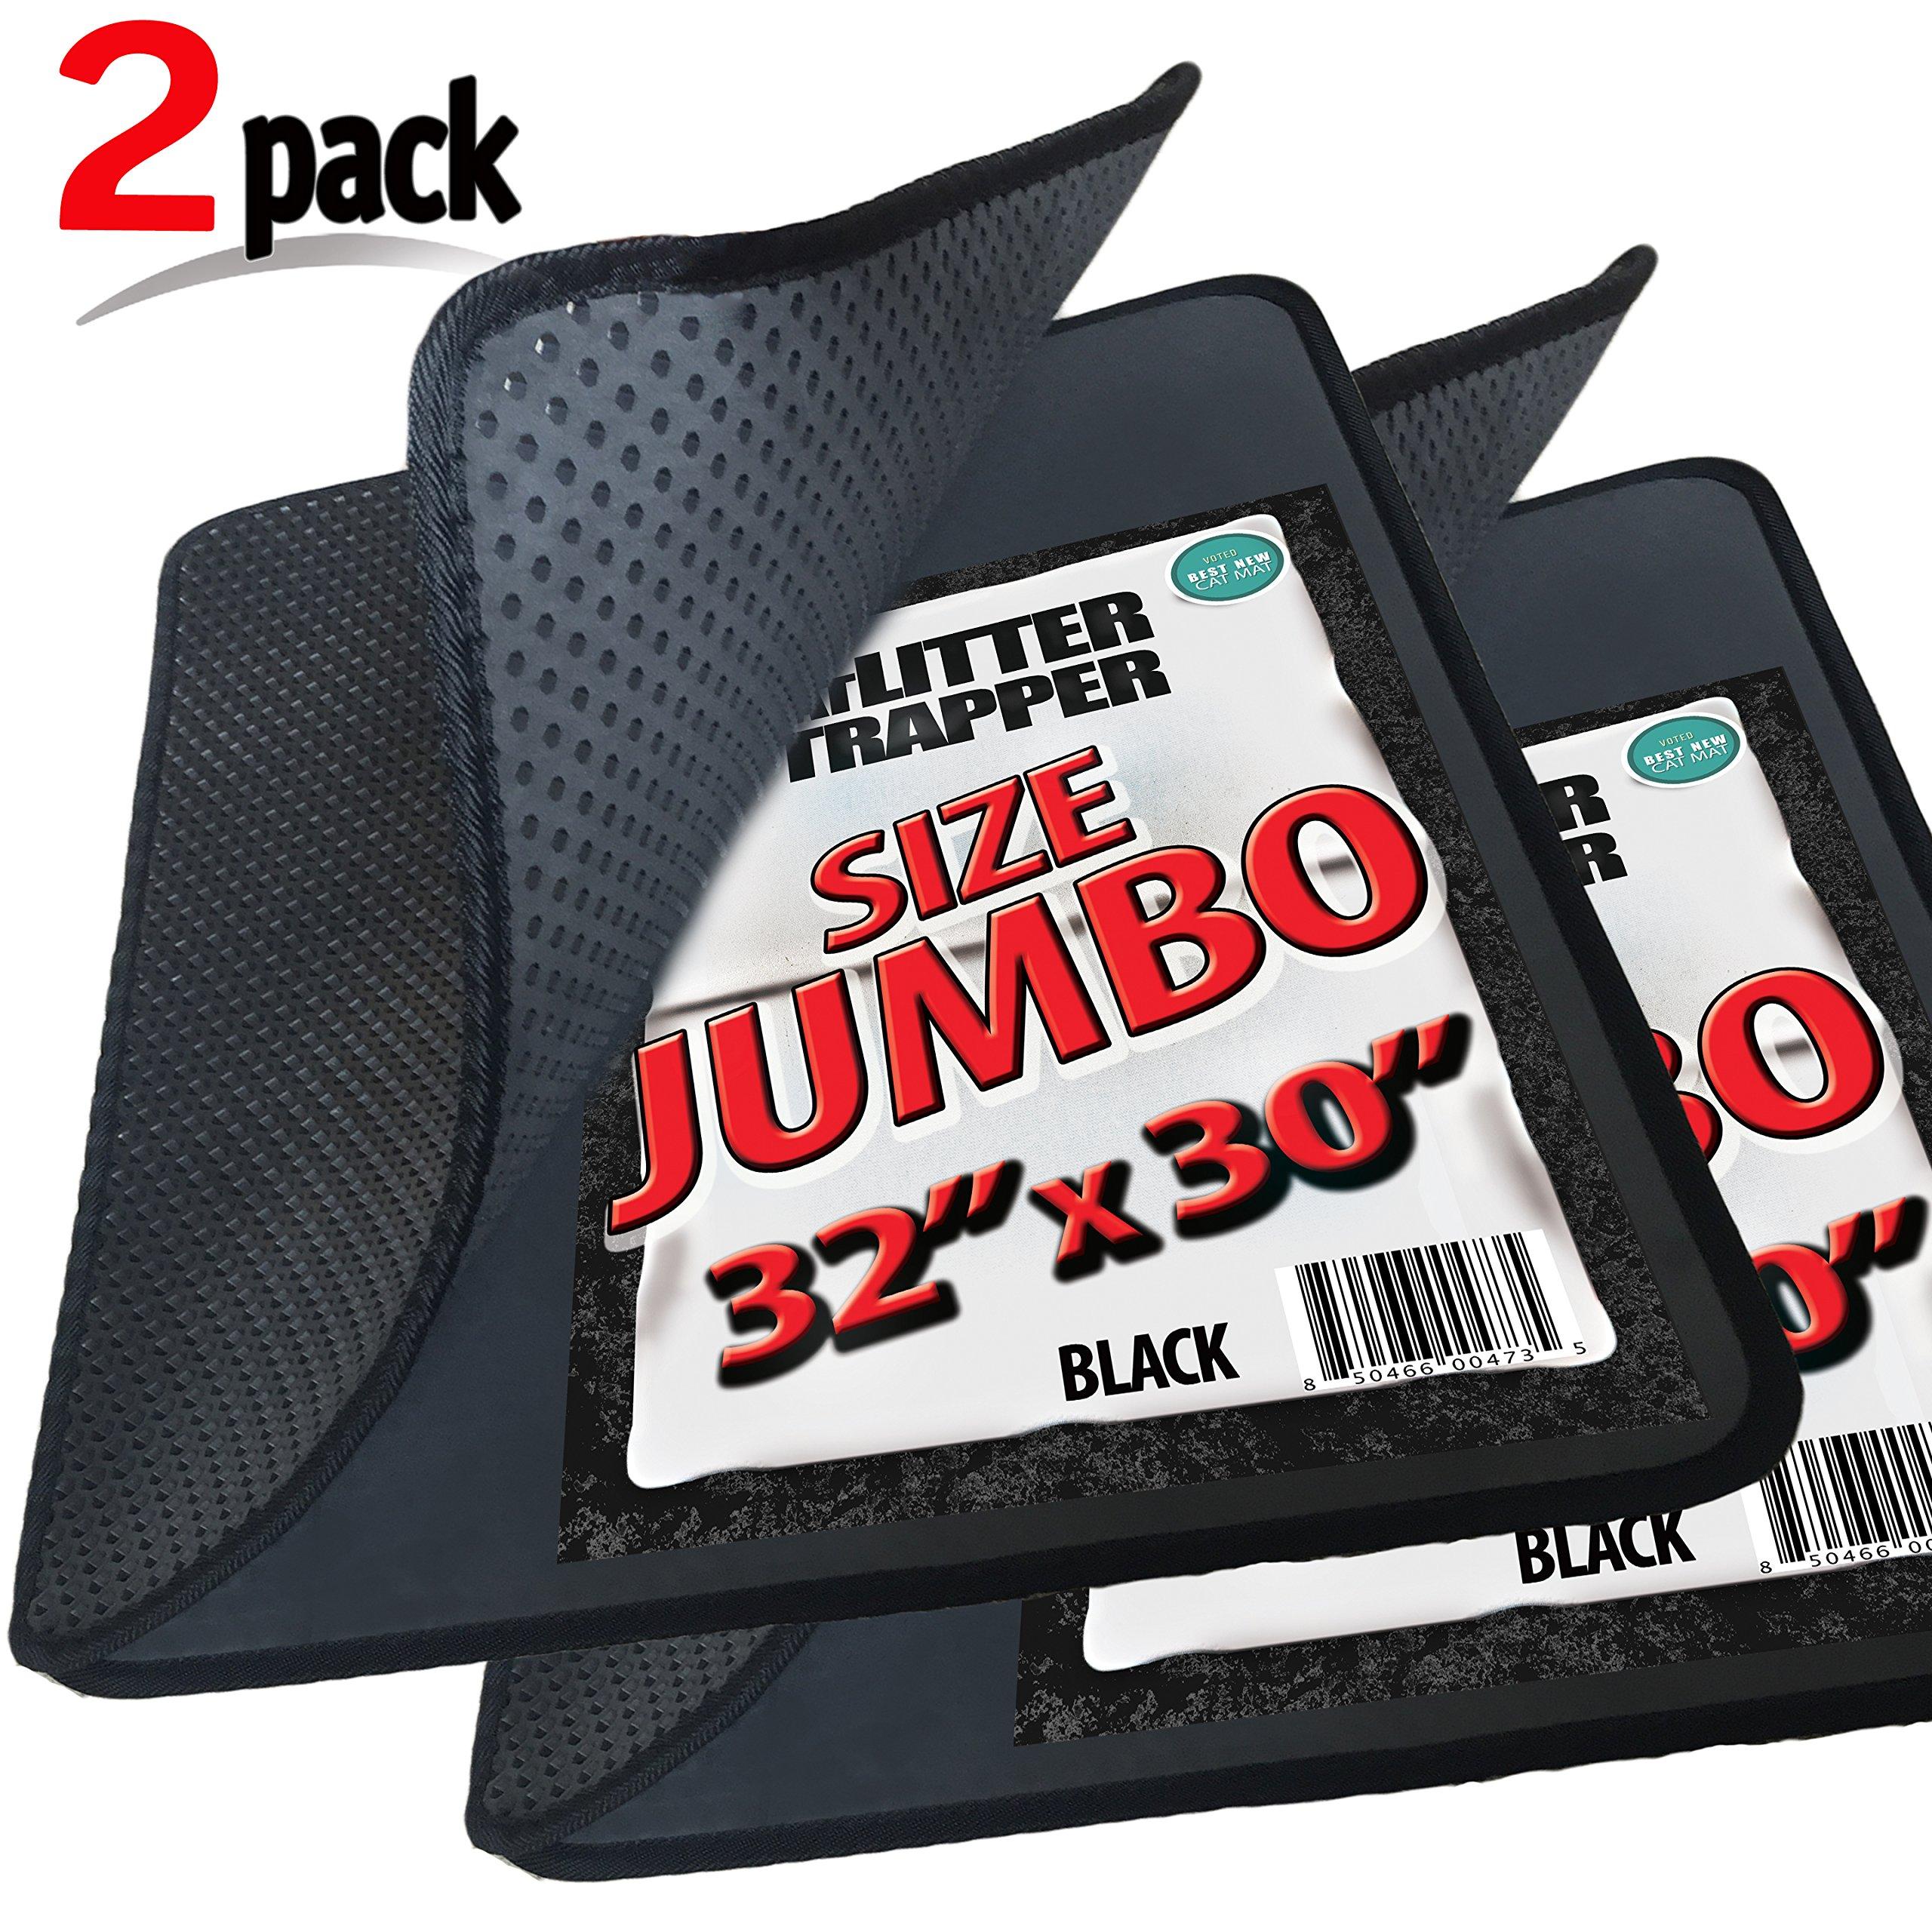 2 Pack Cat Litter Trapper by iPrimio - Litter Mat, EZ Clean Cat Mat, Litter Box Mat Water Proof Layer and Puppy Pad Option. Patent Pending. (32''x30'')(Jumbo, Black)